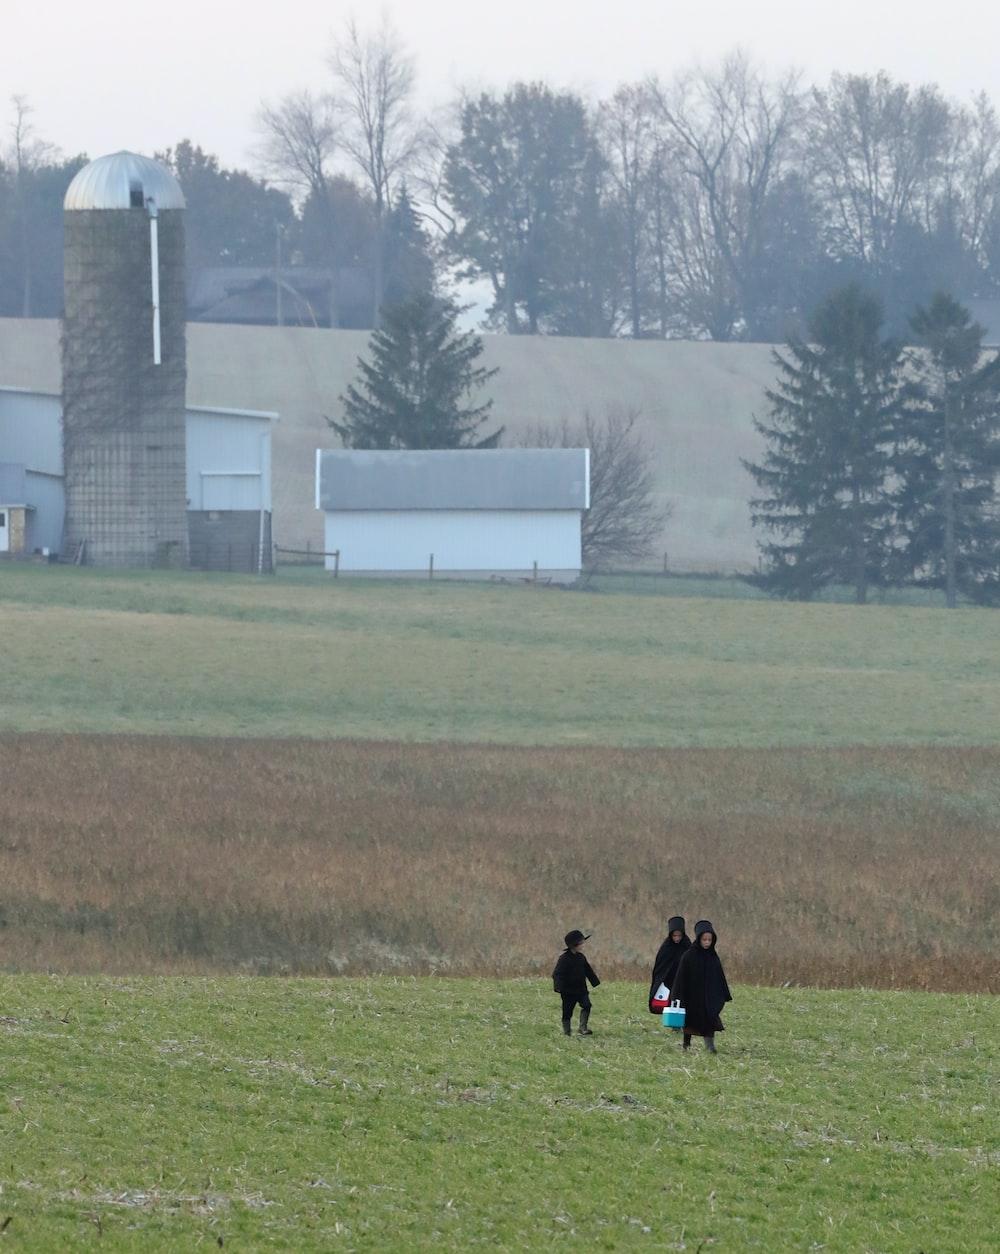 three people walking on grassy field